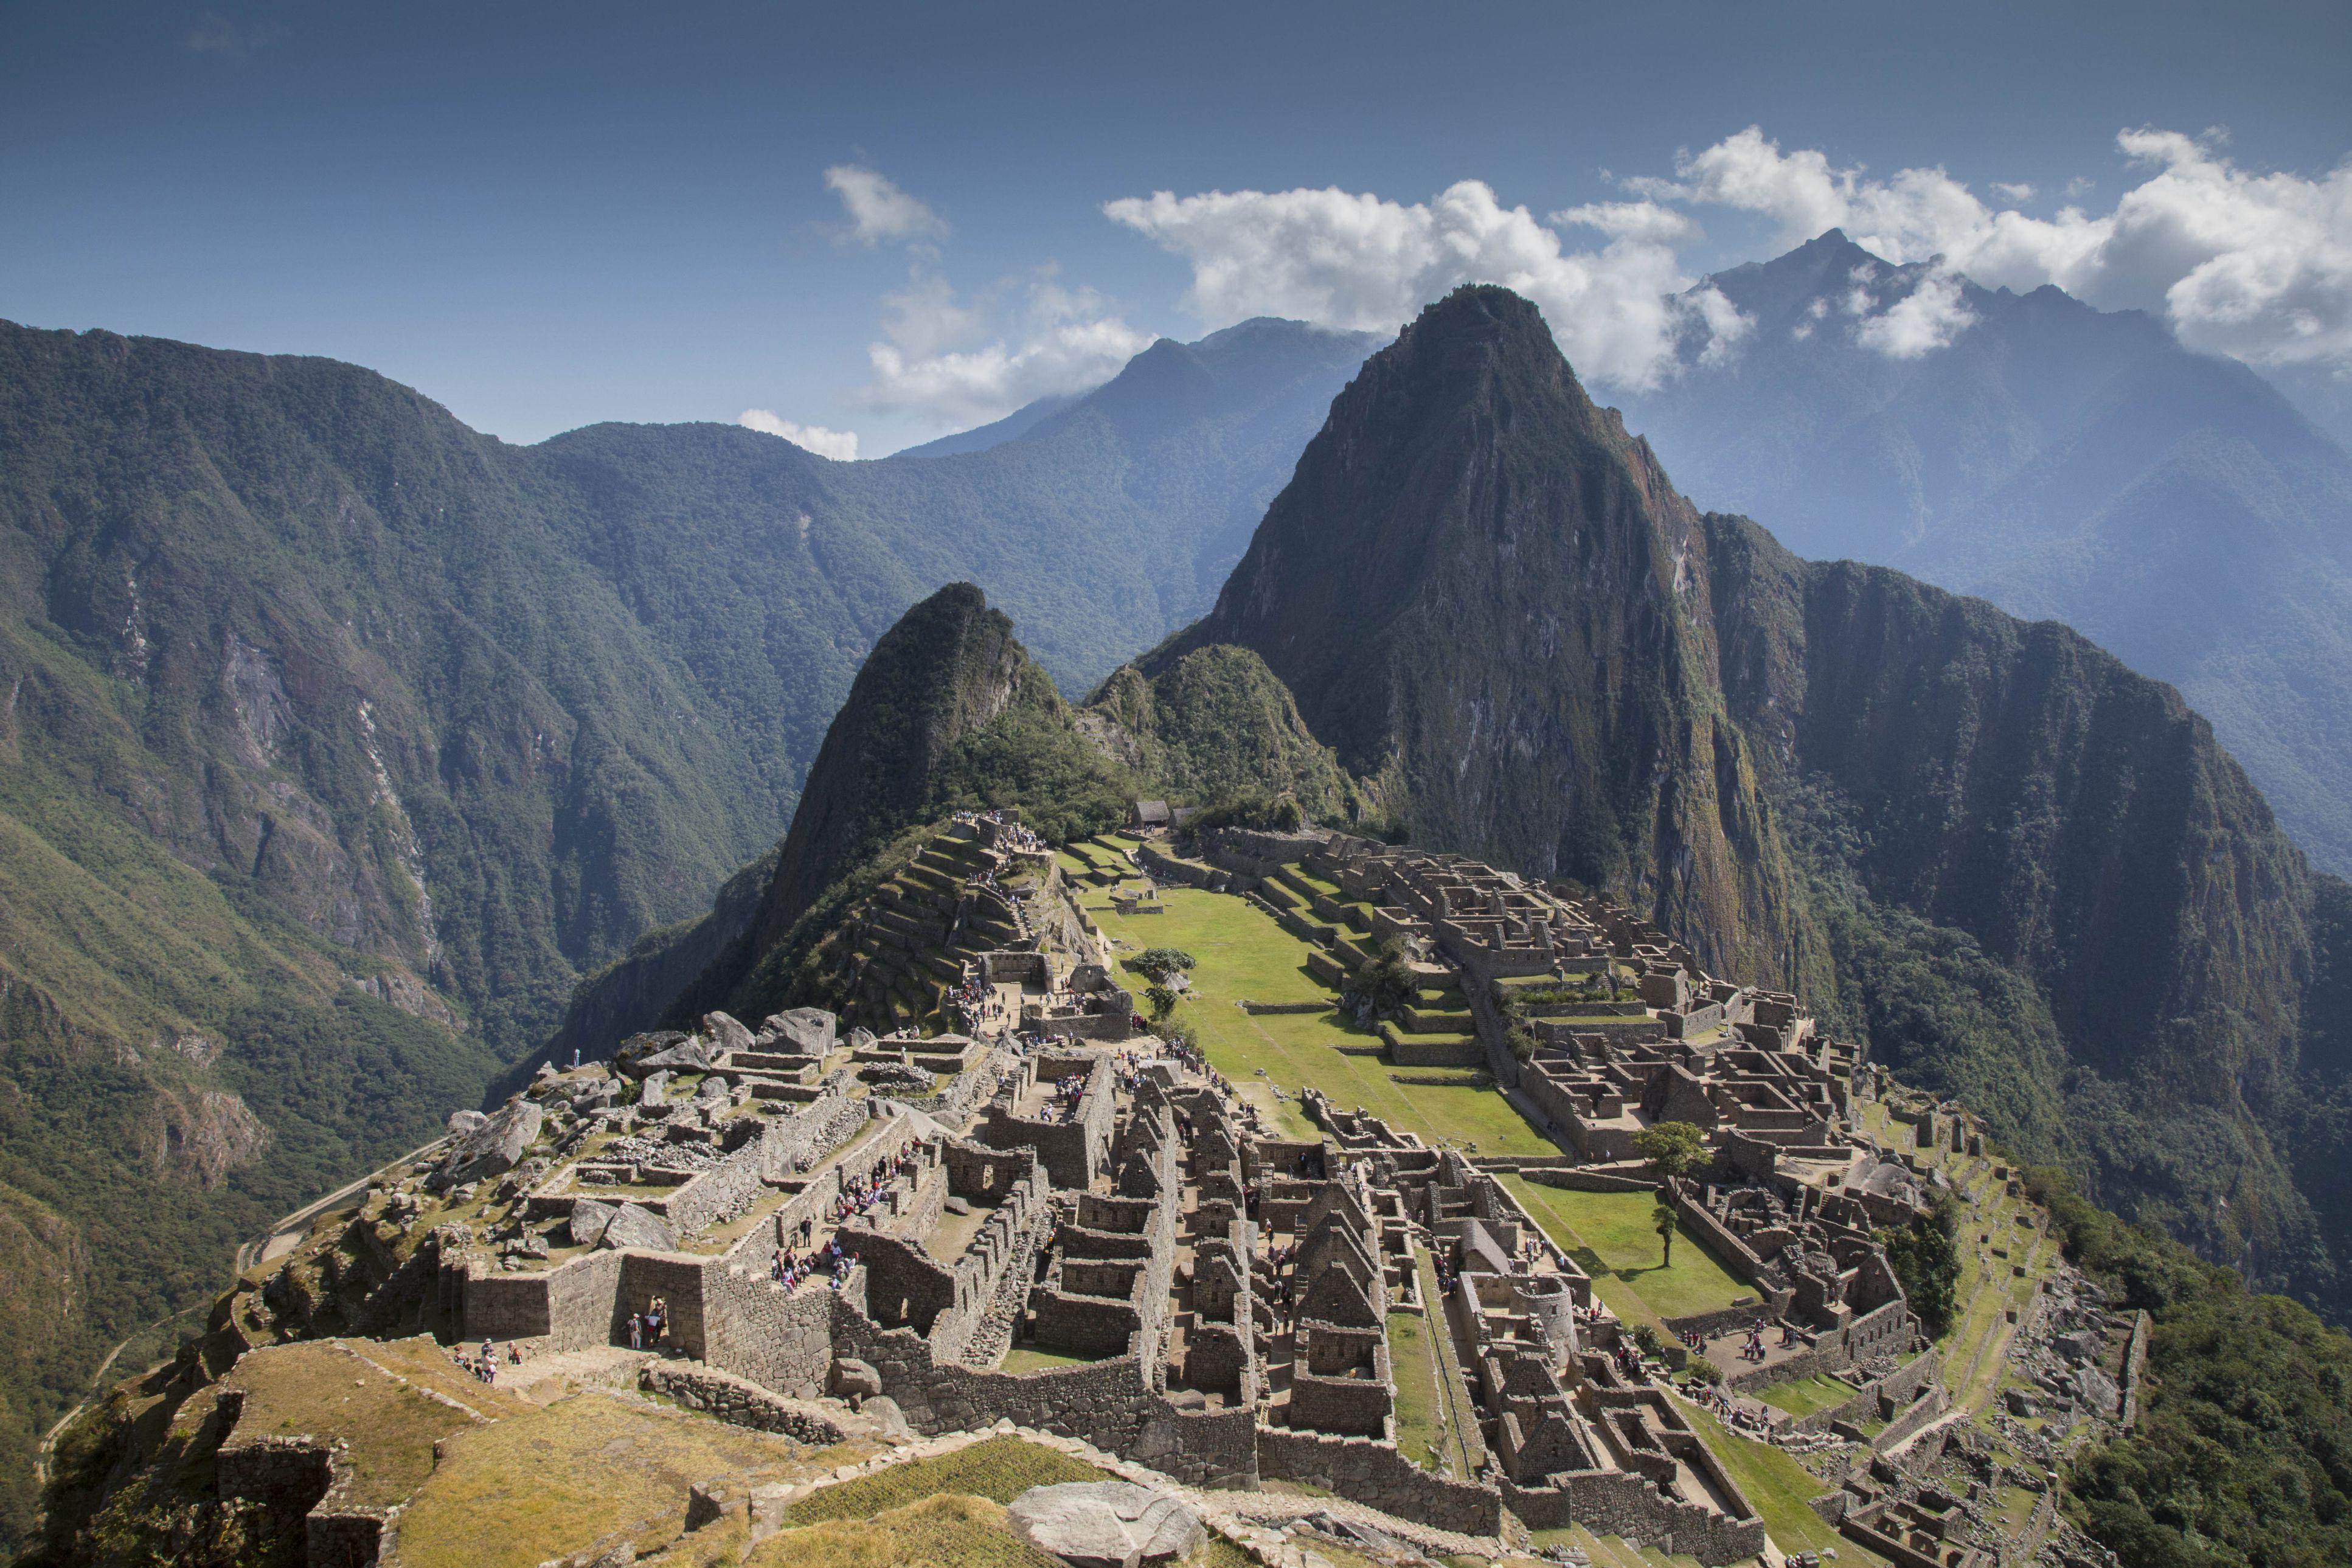 Machu Picchu, 15th-century Inca site at 2,430 metres on mountain ridge above Peru Urubamba Valley